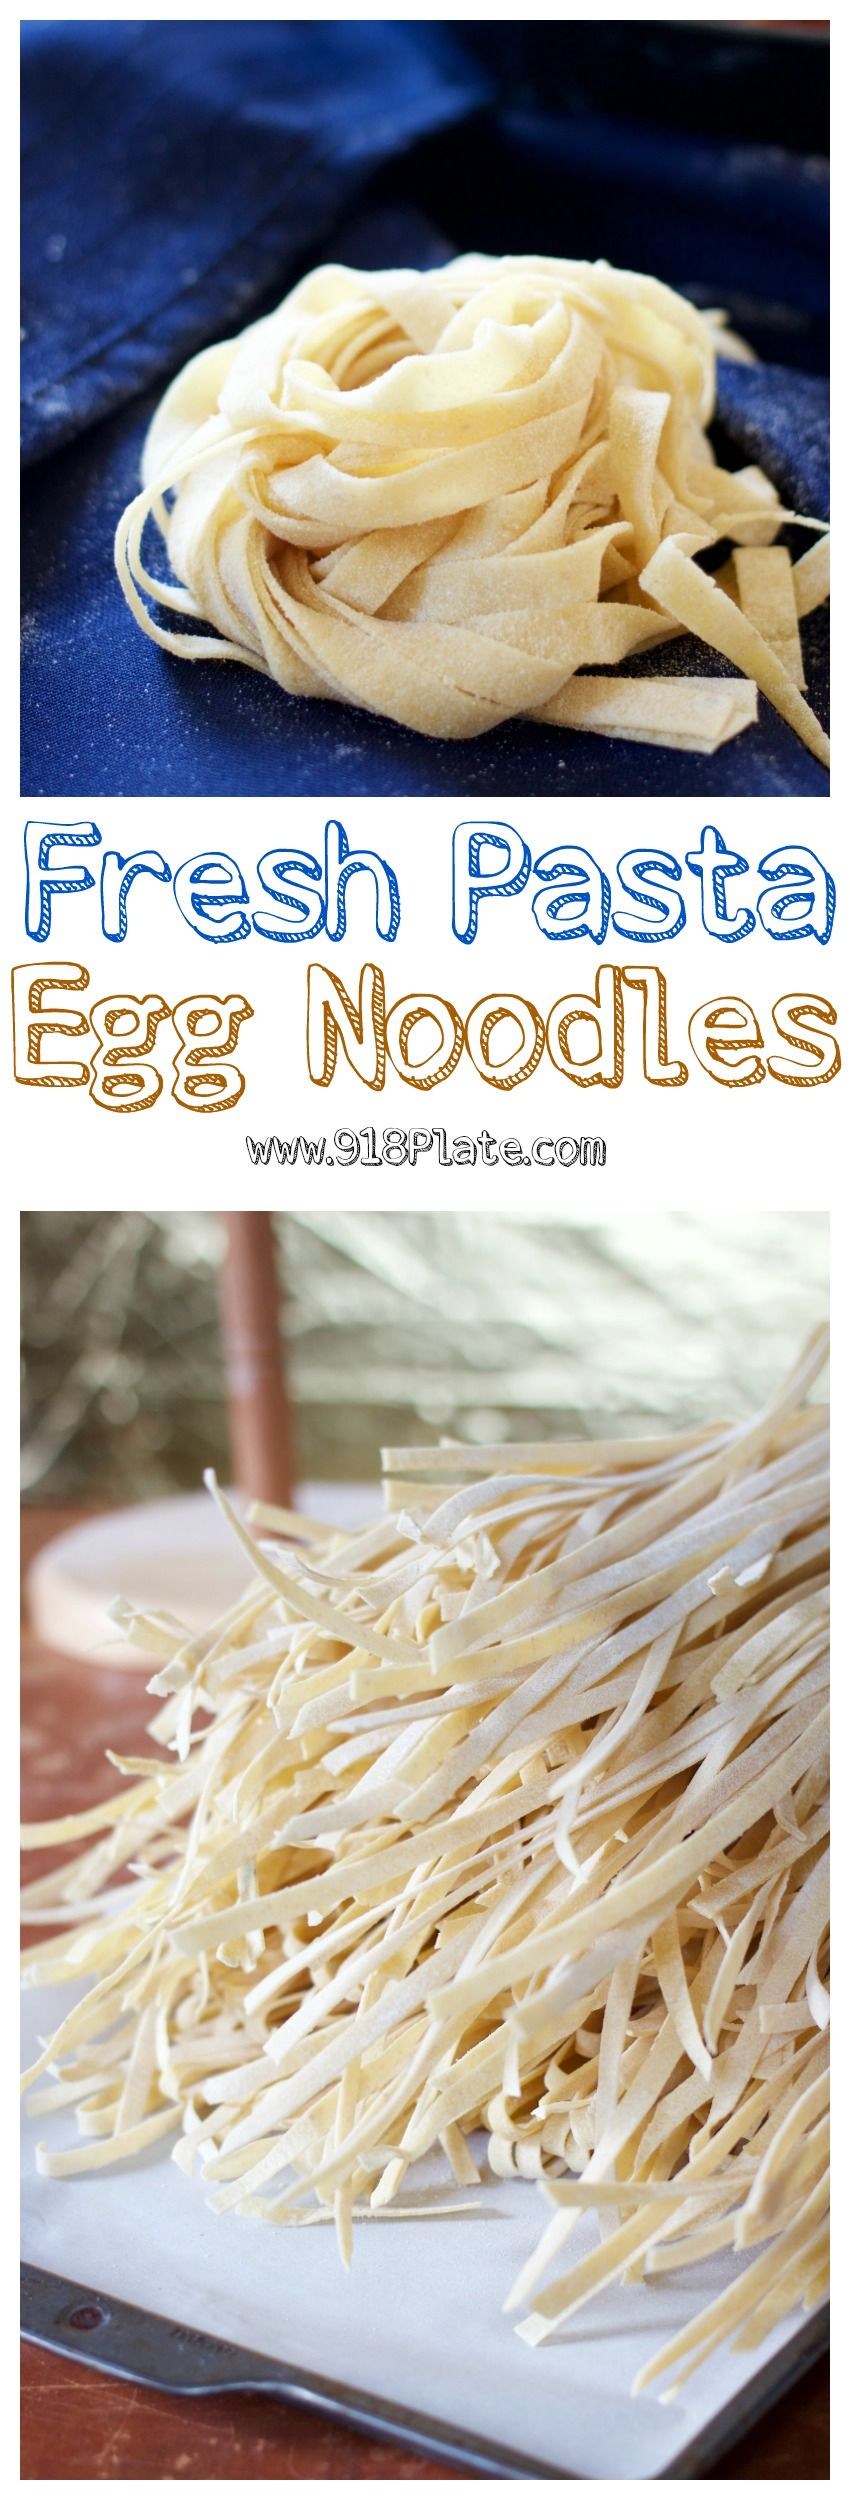 Fresh pasta 918 plate recipe fresh pasta recipes food